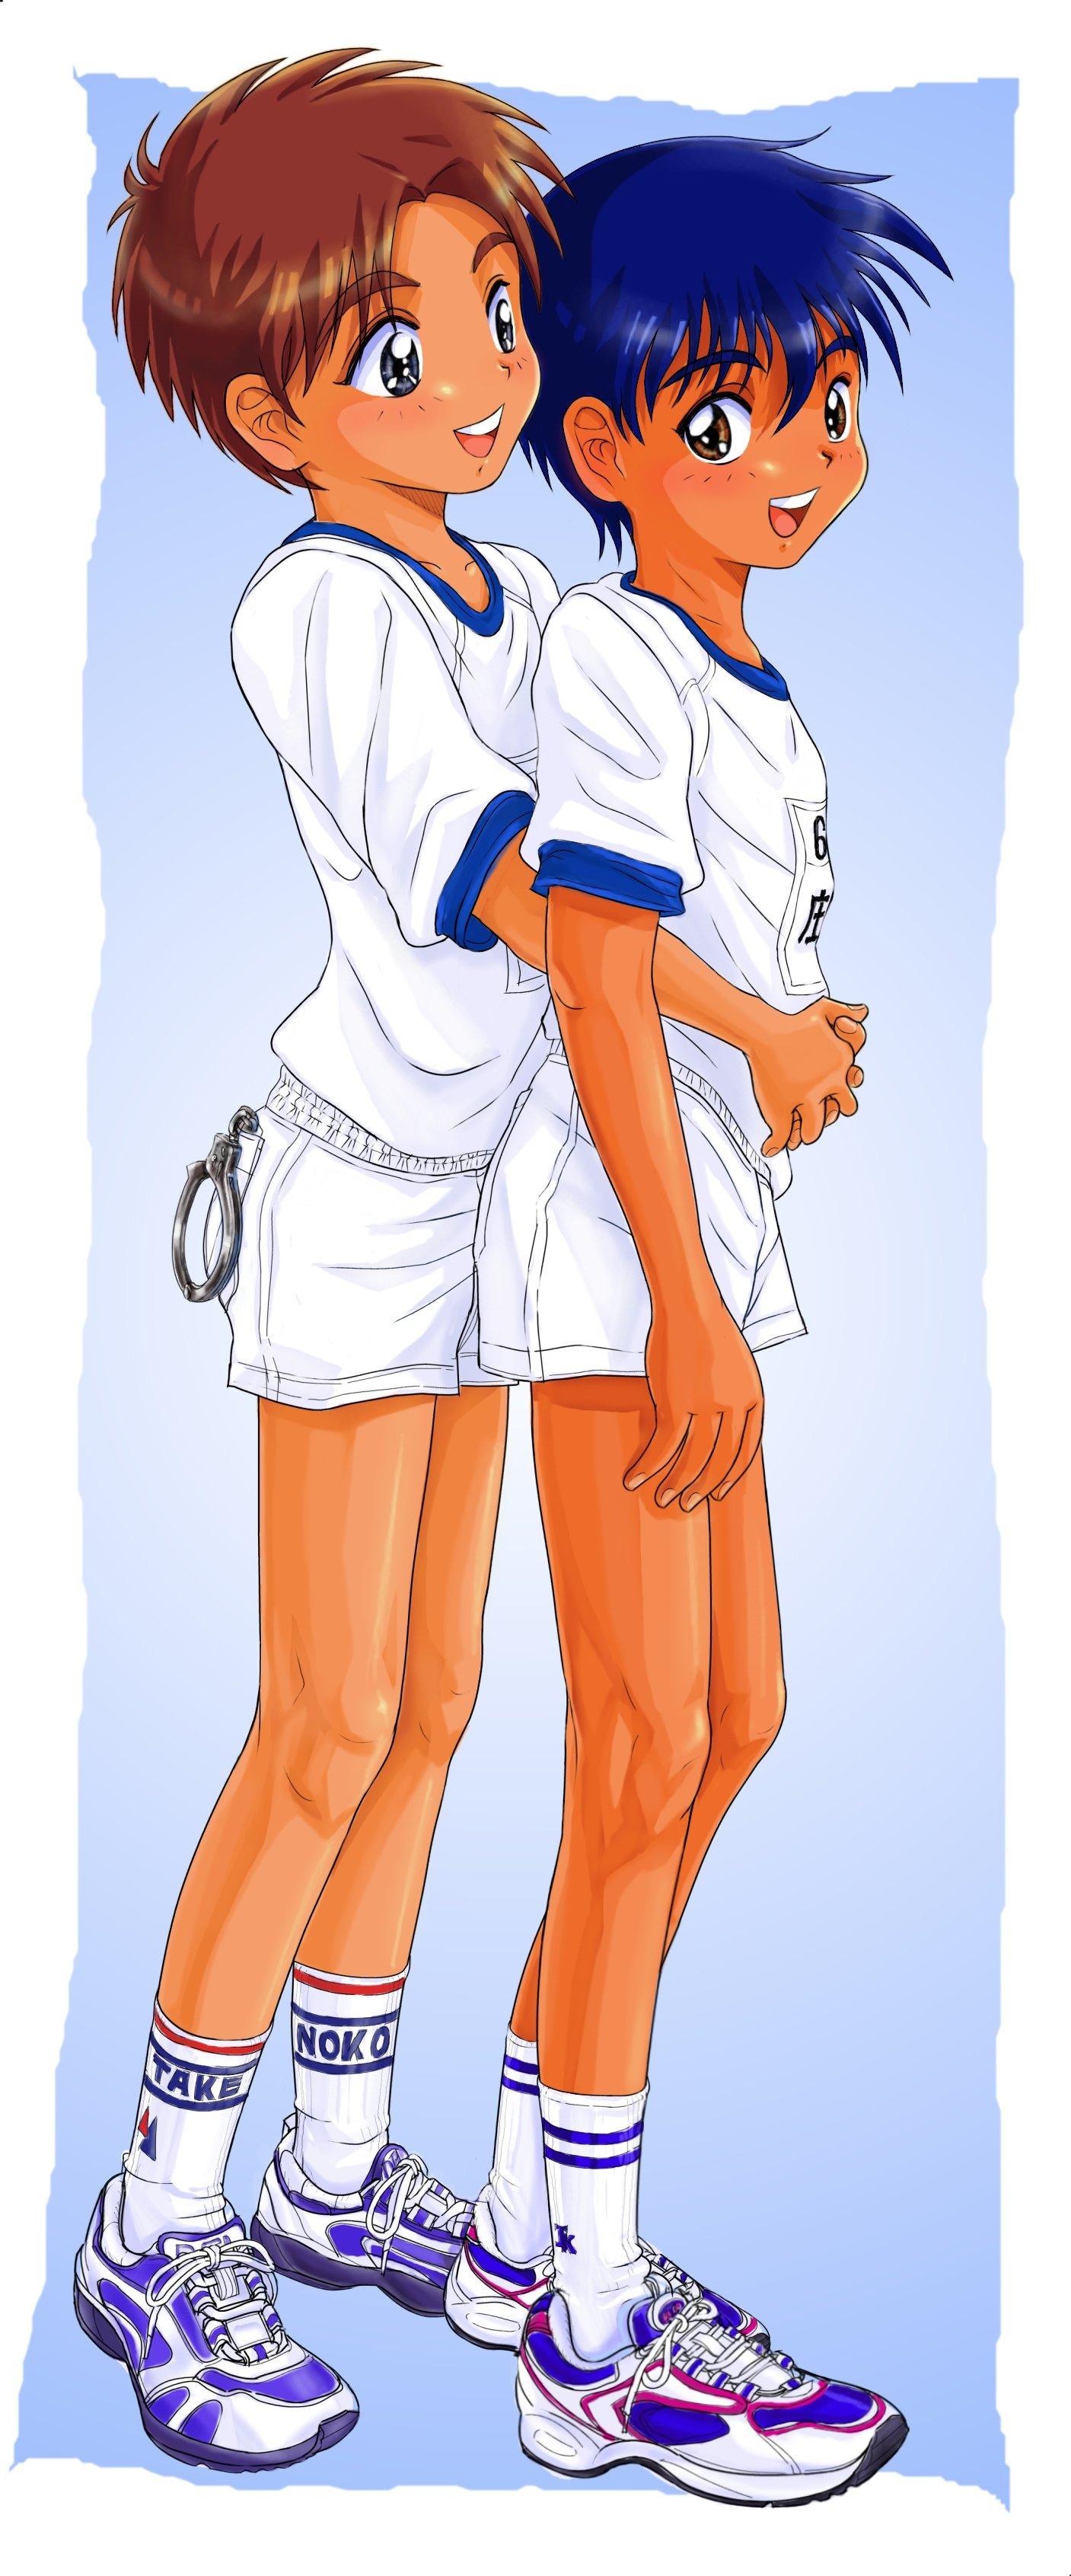 Safebooru - 2boys blush child hug male focus multiple boys